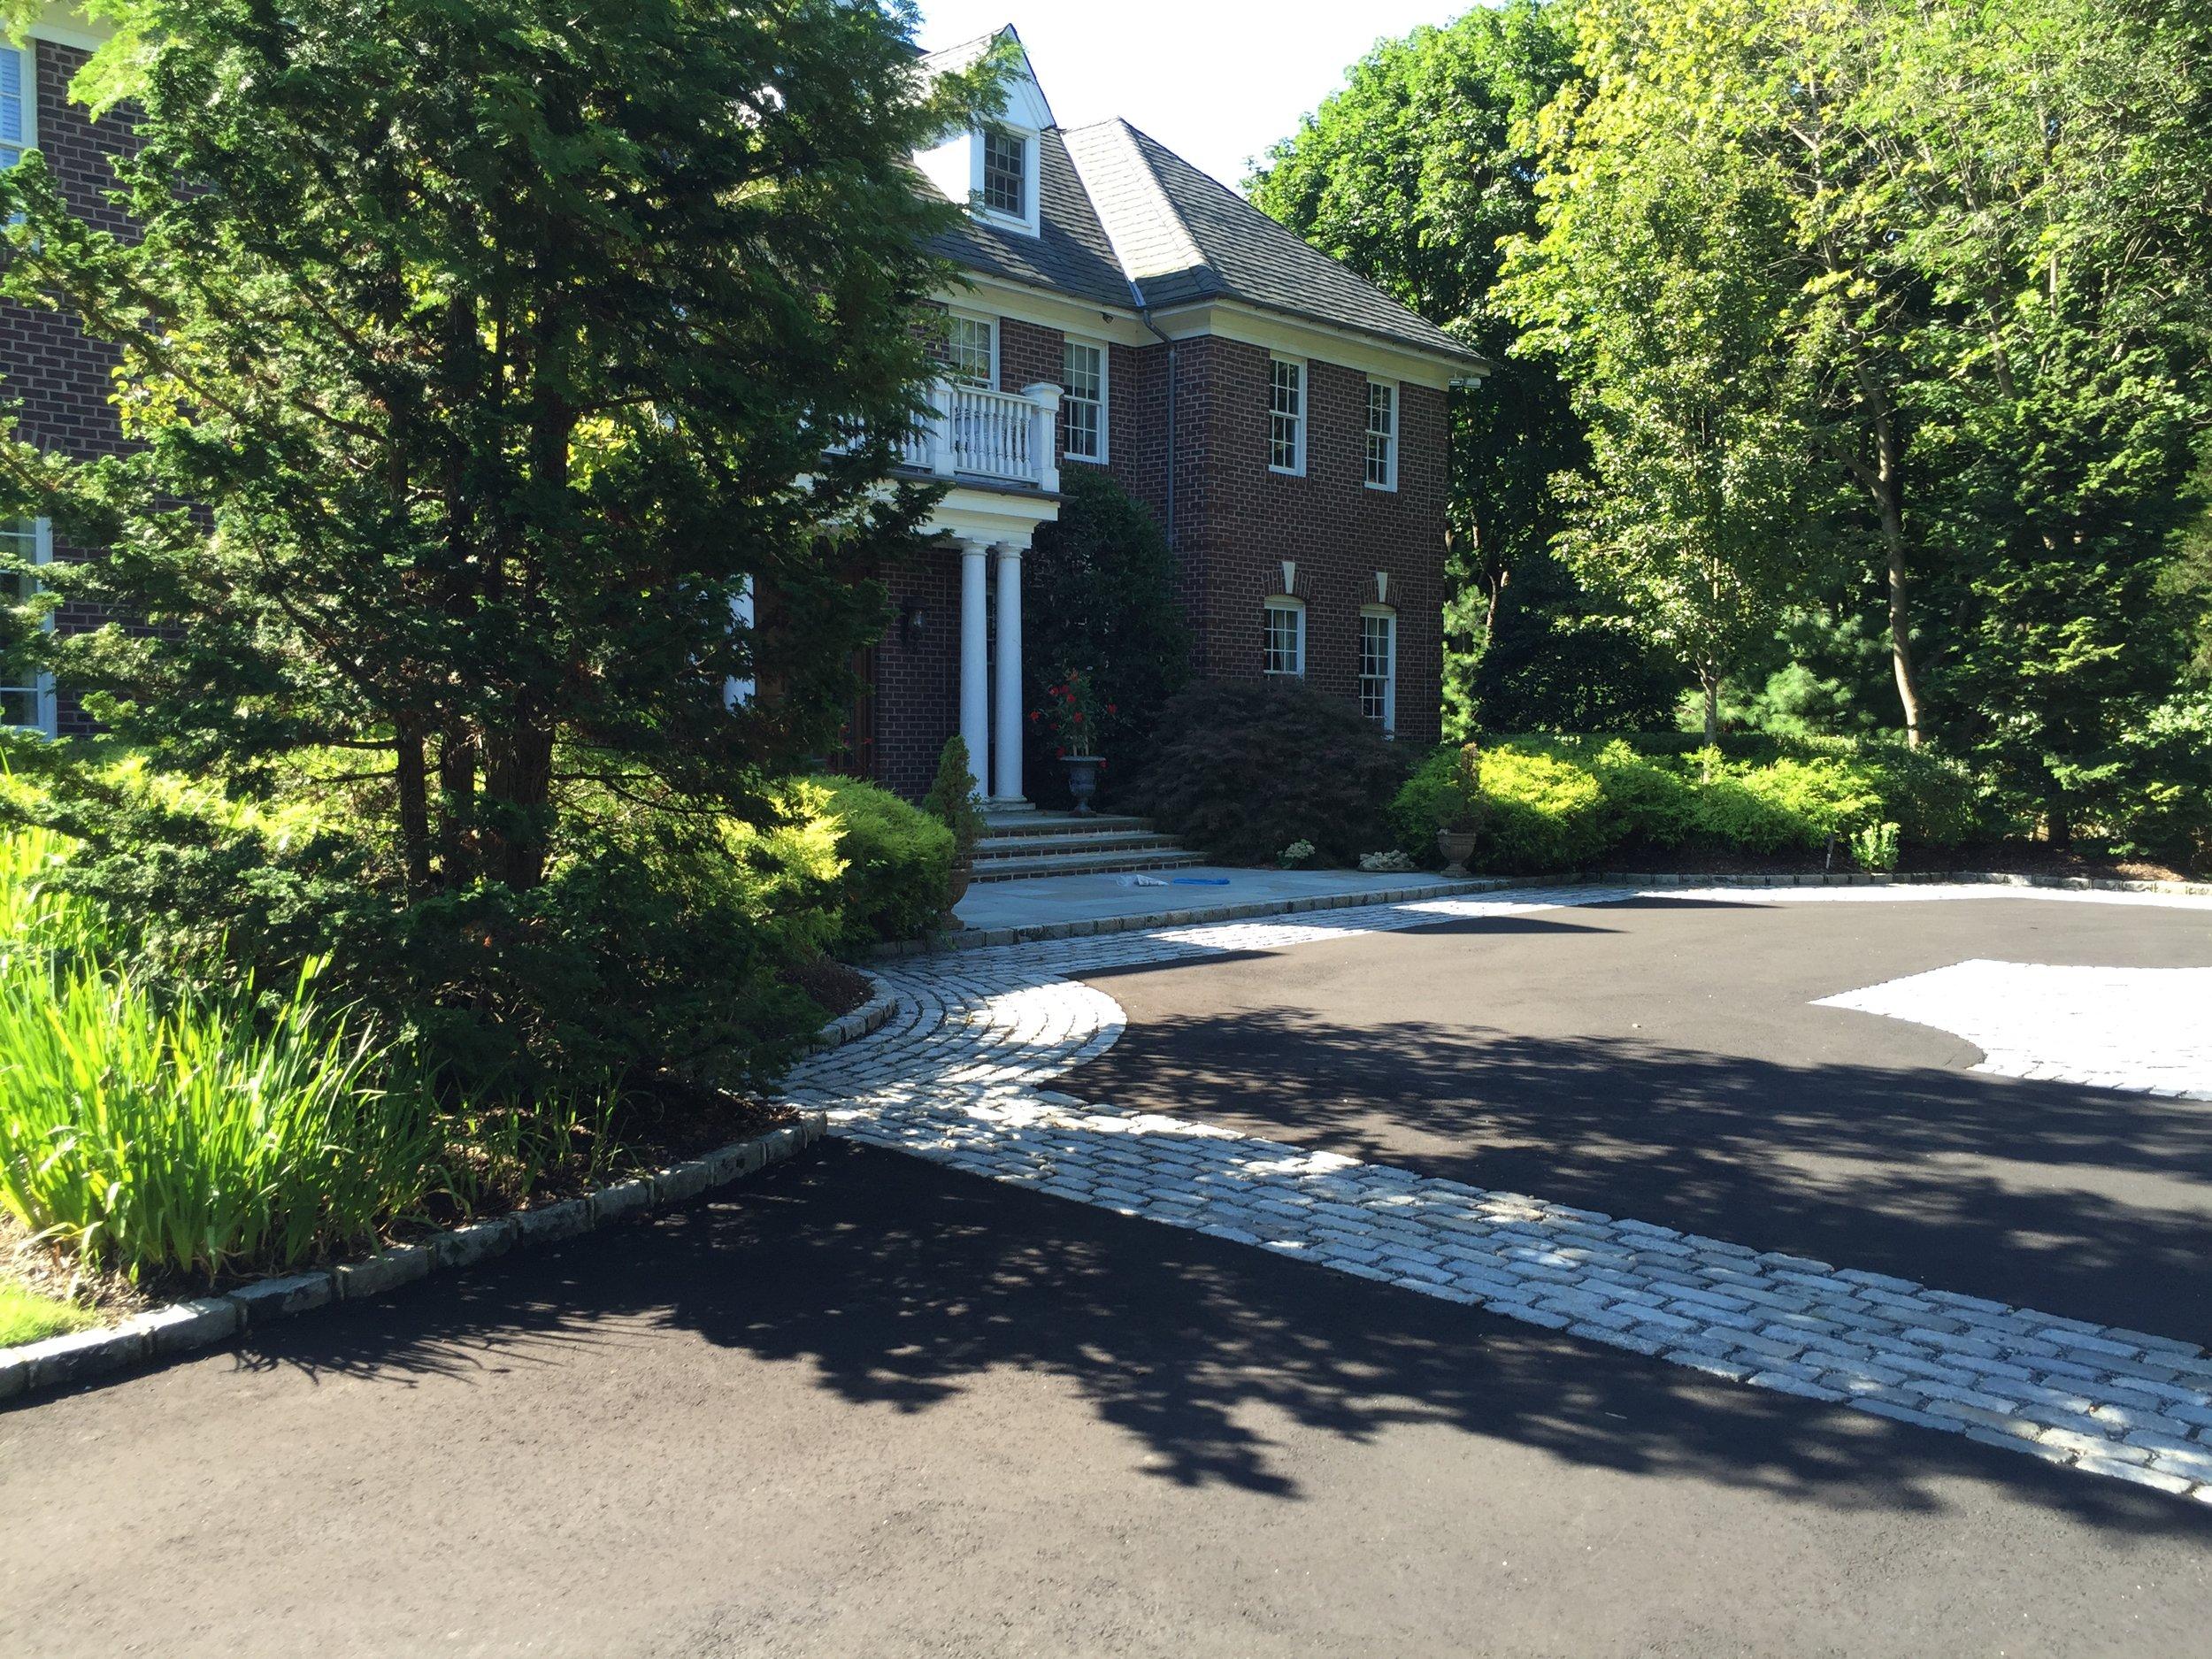 Professional Unilock driveway paver company in Long Island, NY